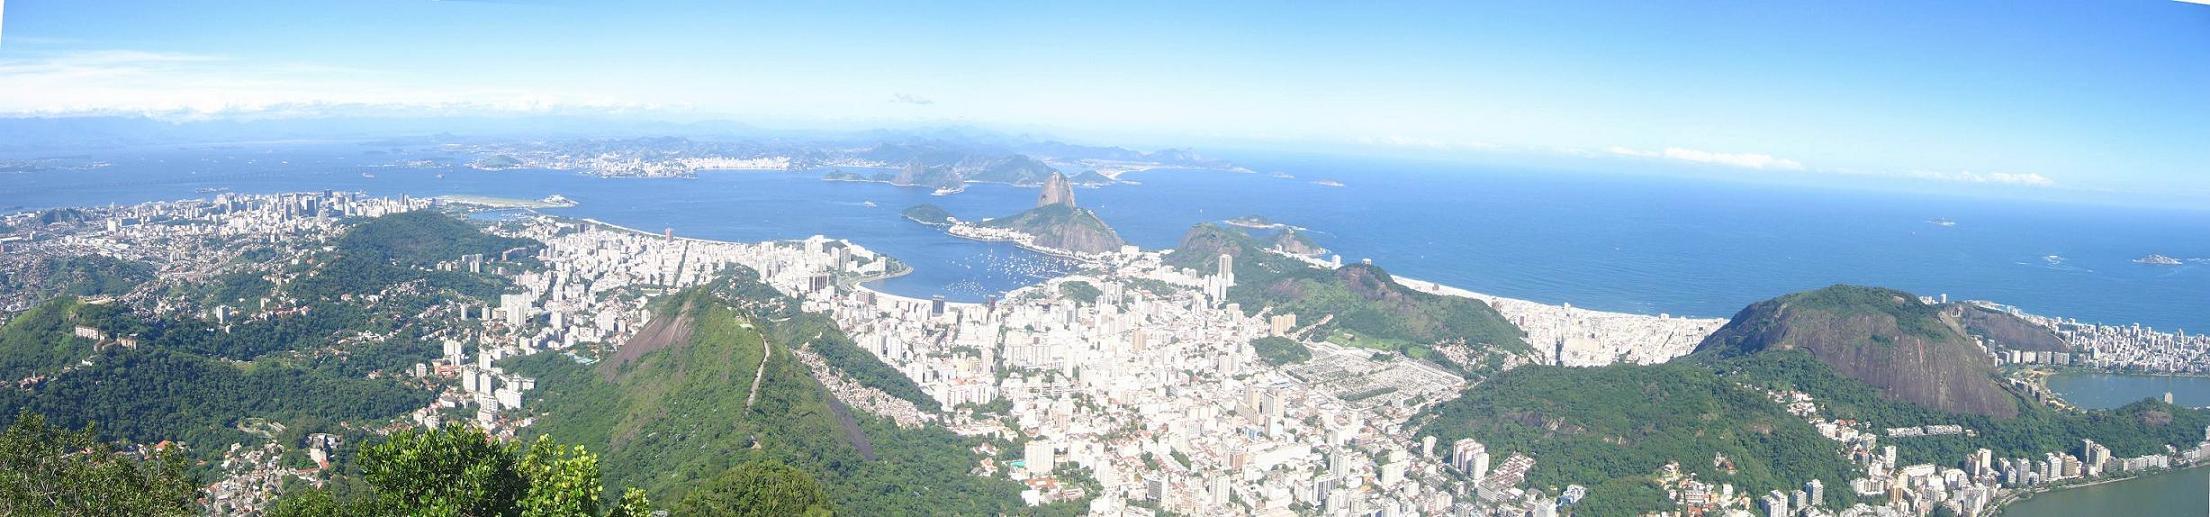 Brazil_rio1_4